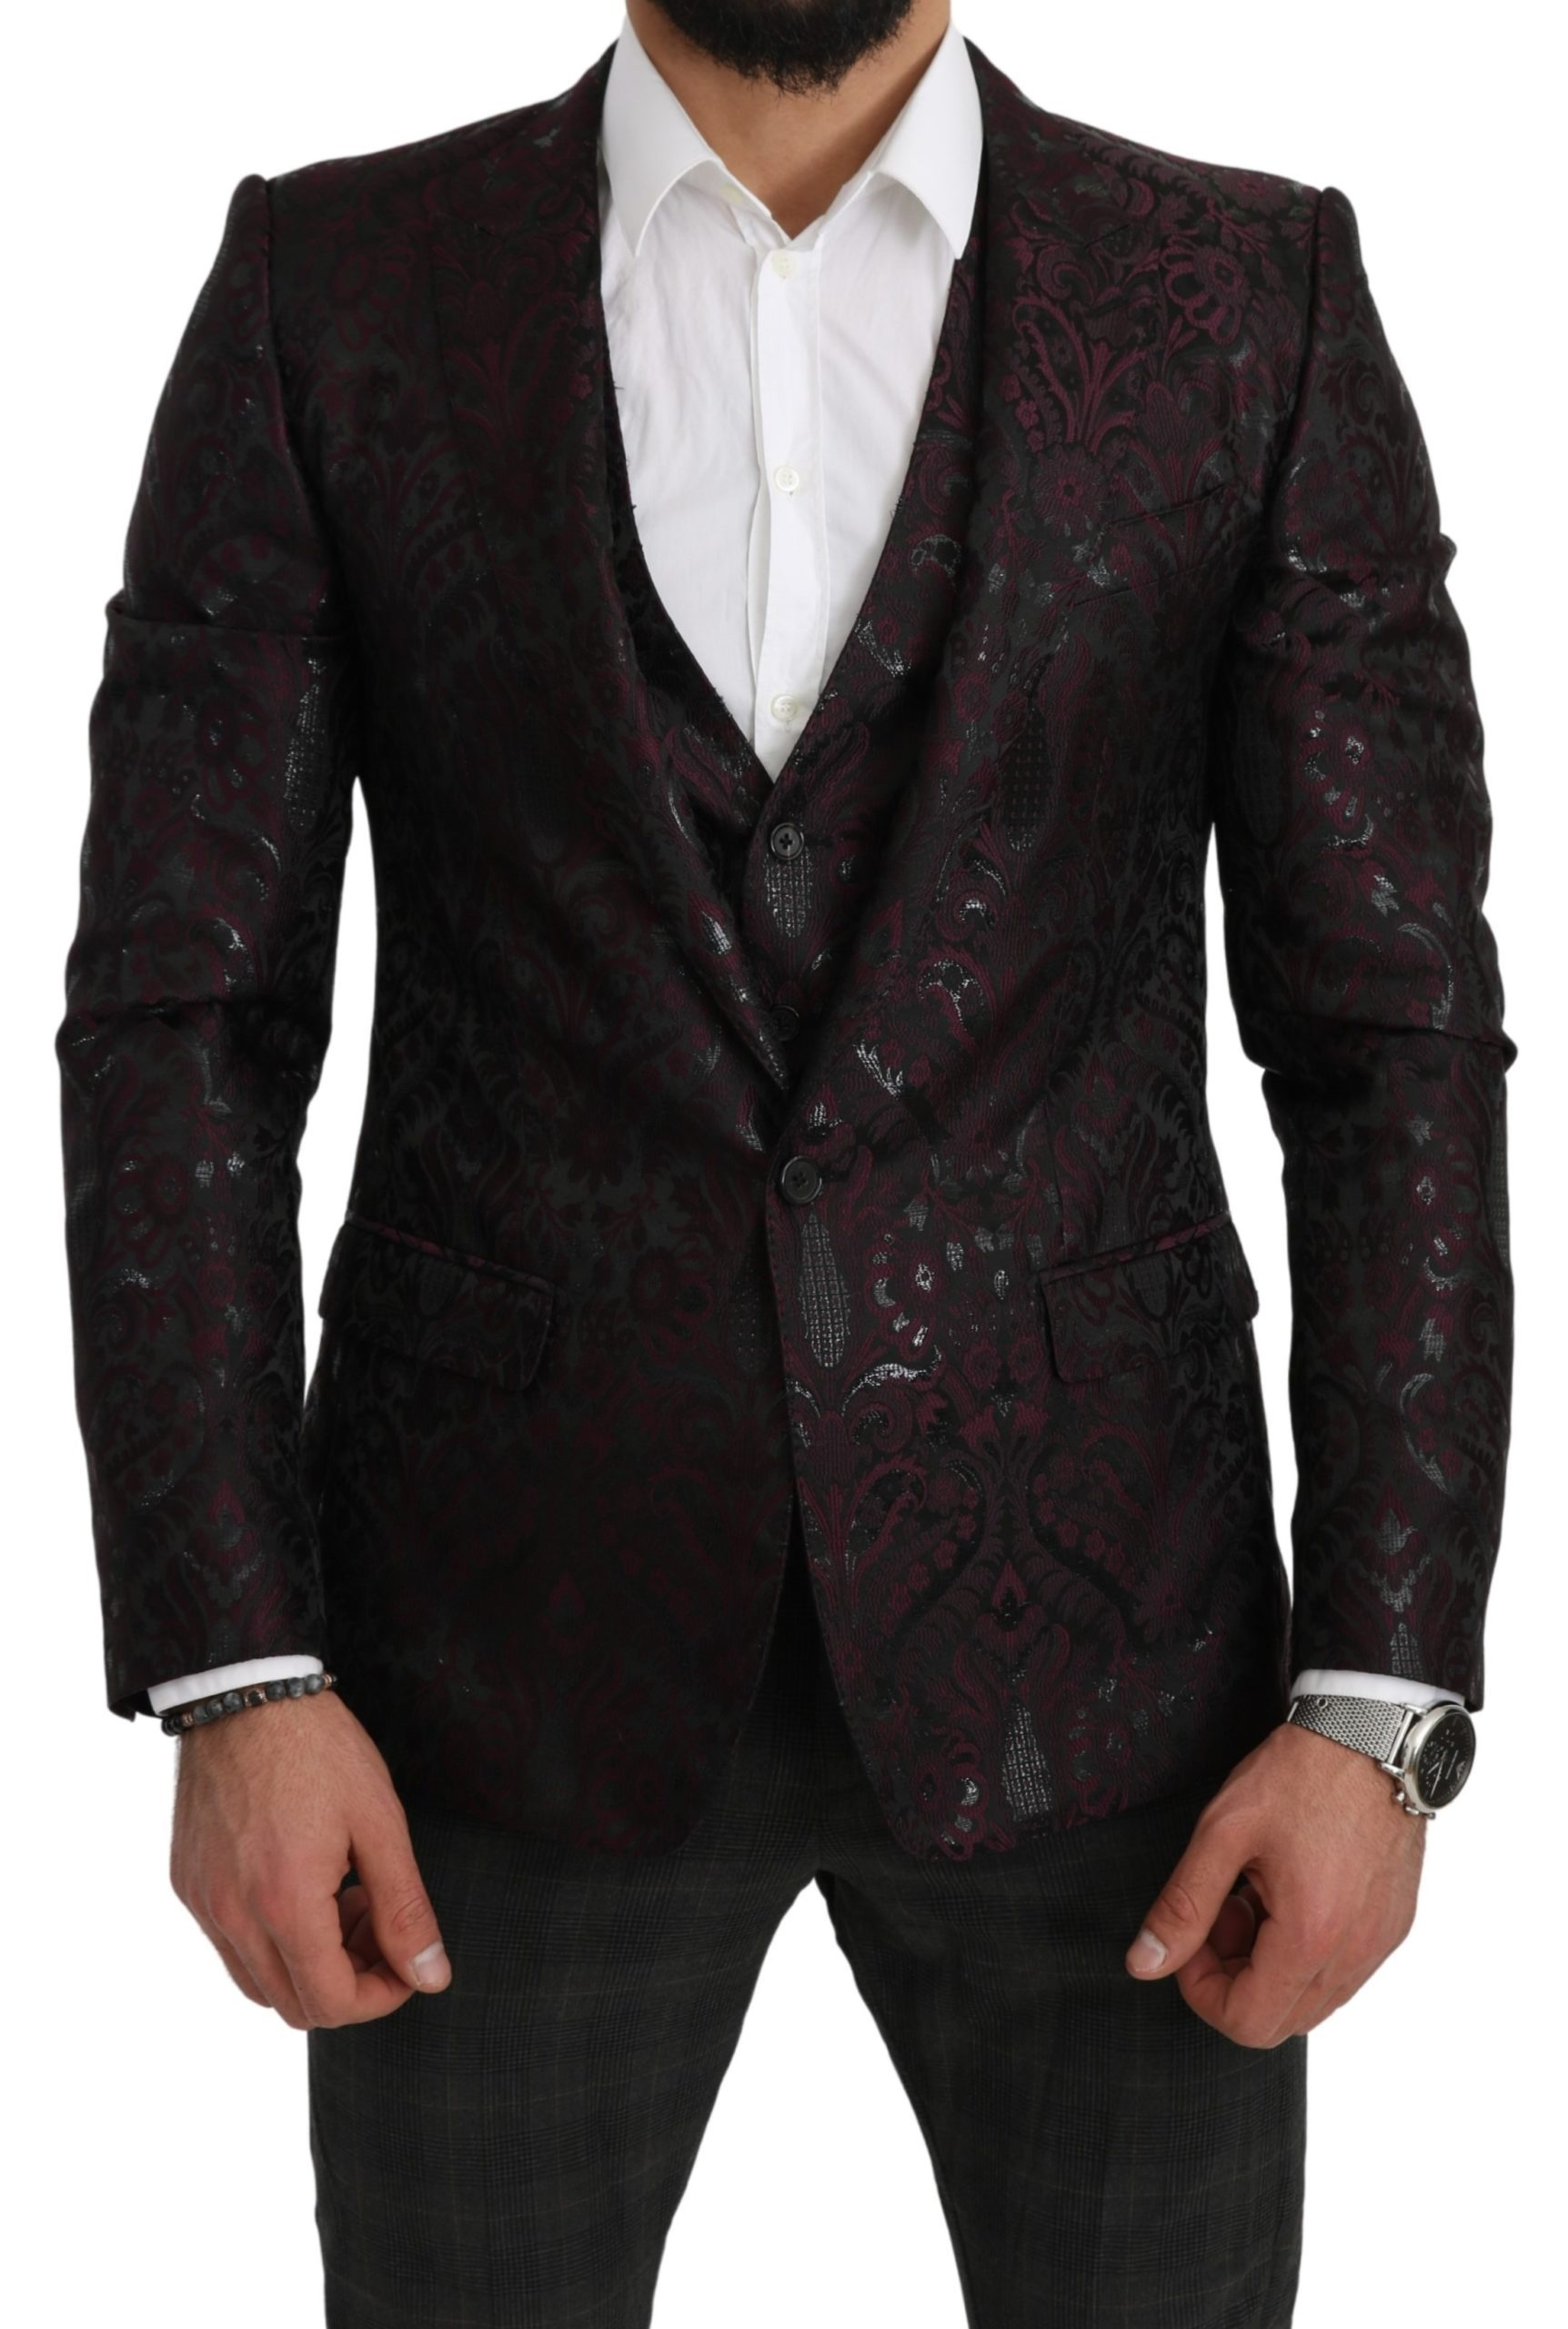 Dolce & Gabbana Men's Jacquard Floral Slim Fit Blazer Black KOS1806 - IT48   M